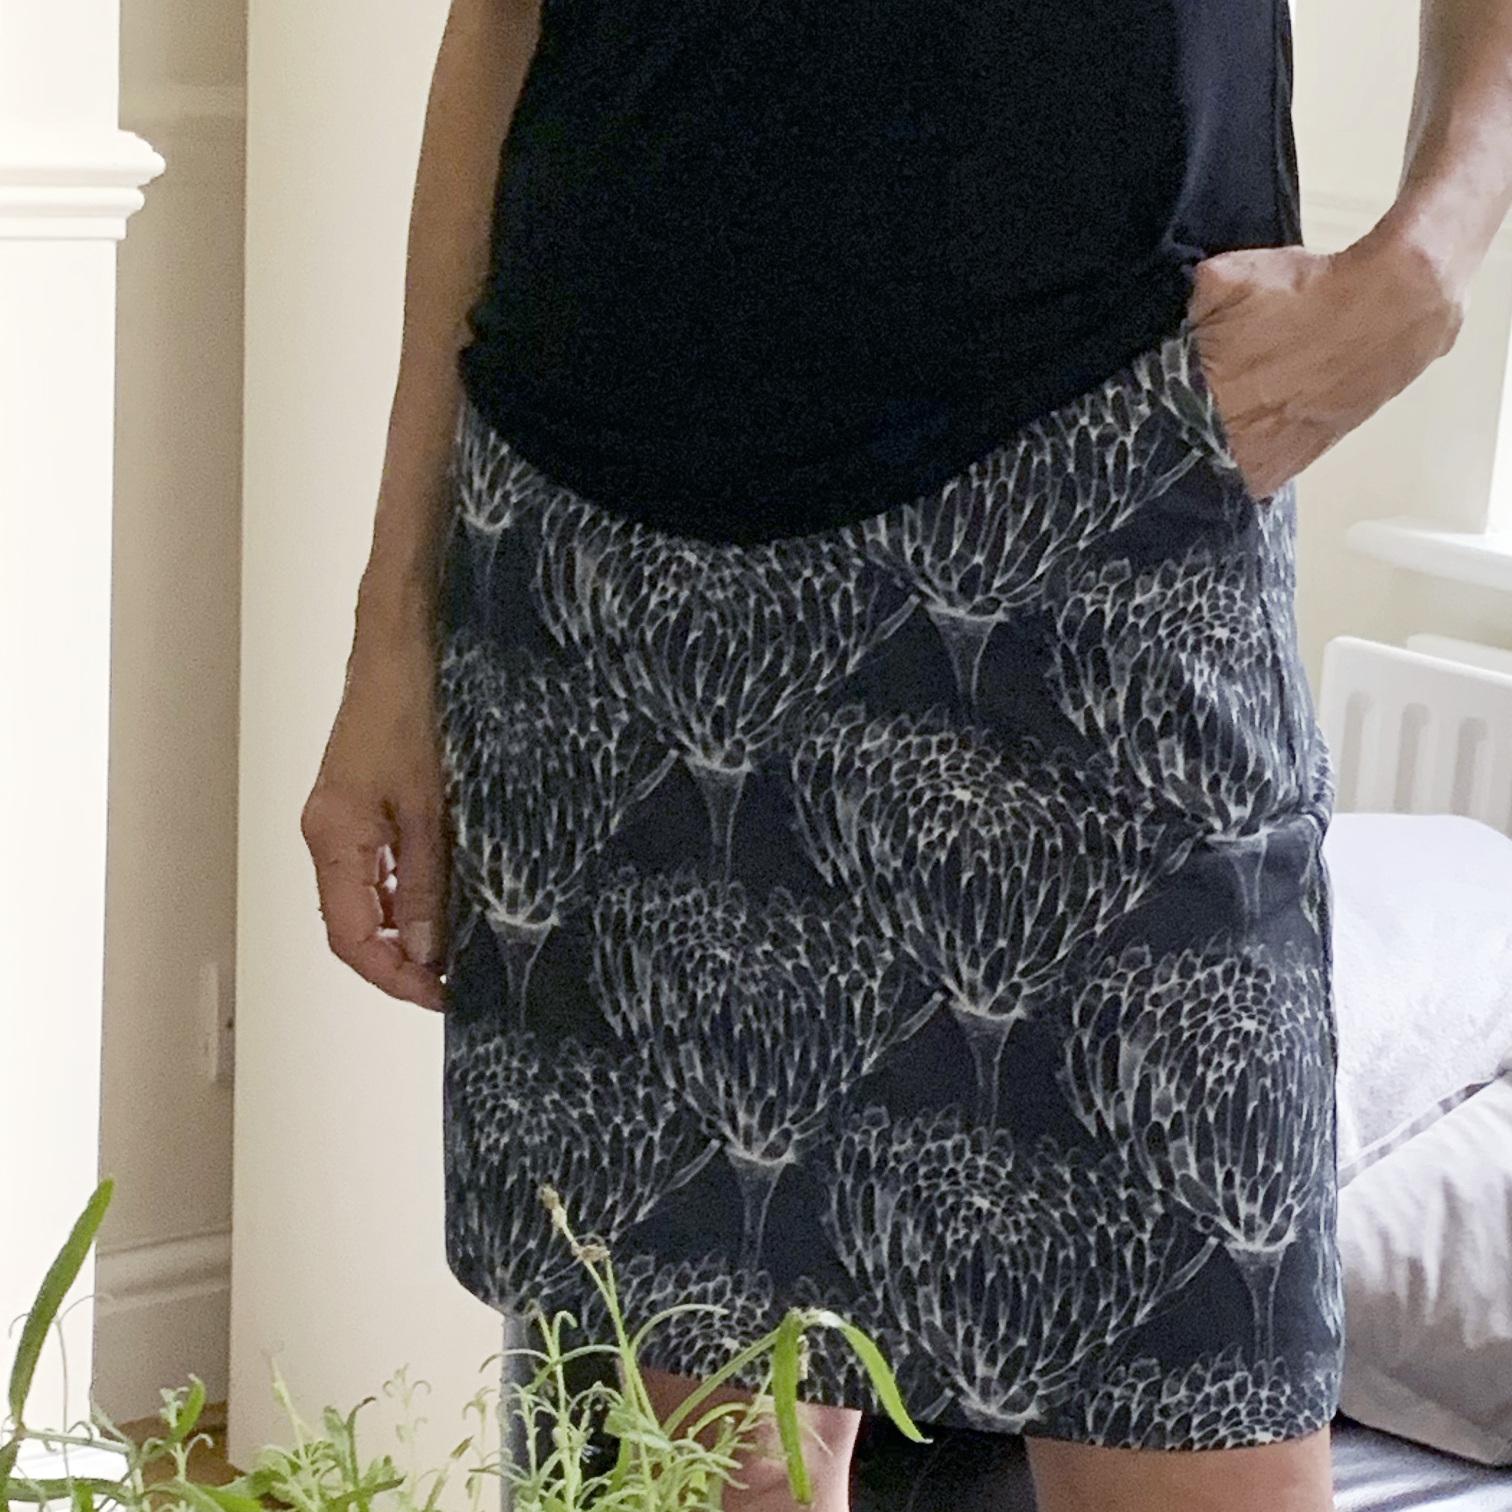 Chrysanthemum Crowd Black Organic Cotton Skirt  by  Mariana Black Designs at DocCotton